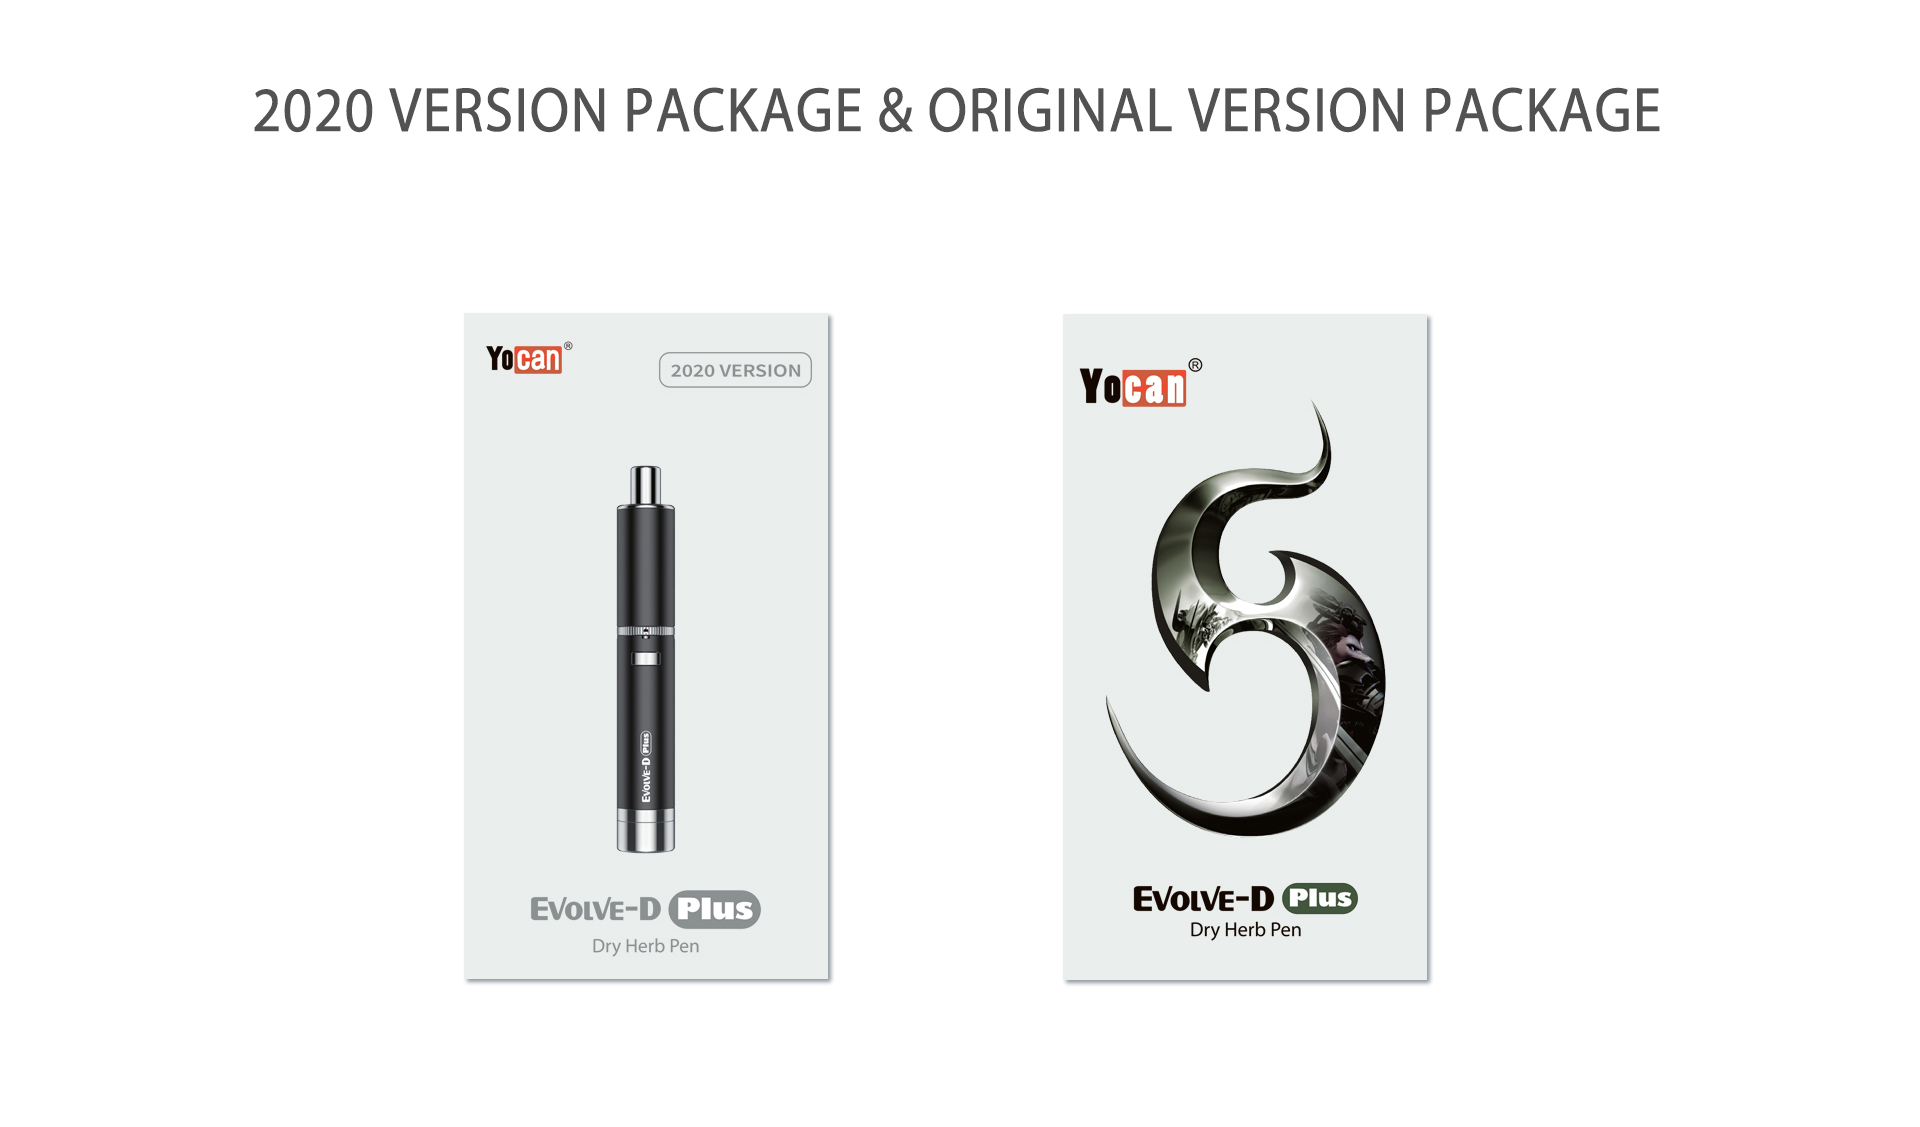 Yocan Evolve-D Plus vaporizer pen 2020 version package box.